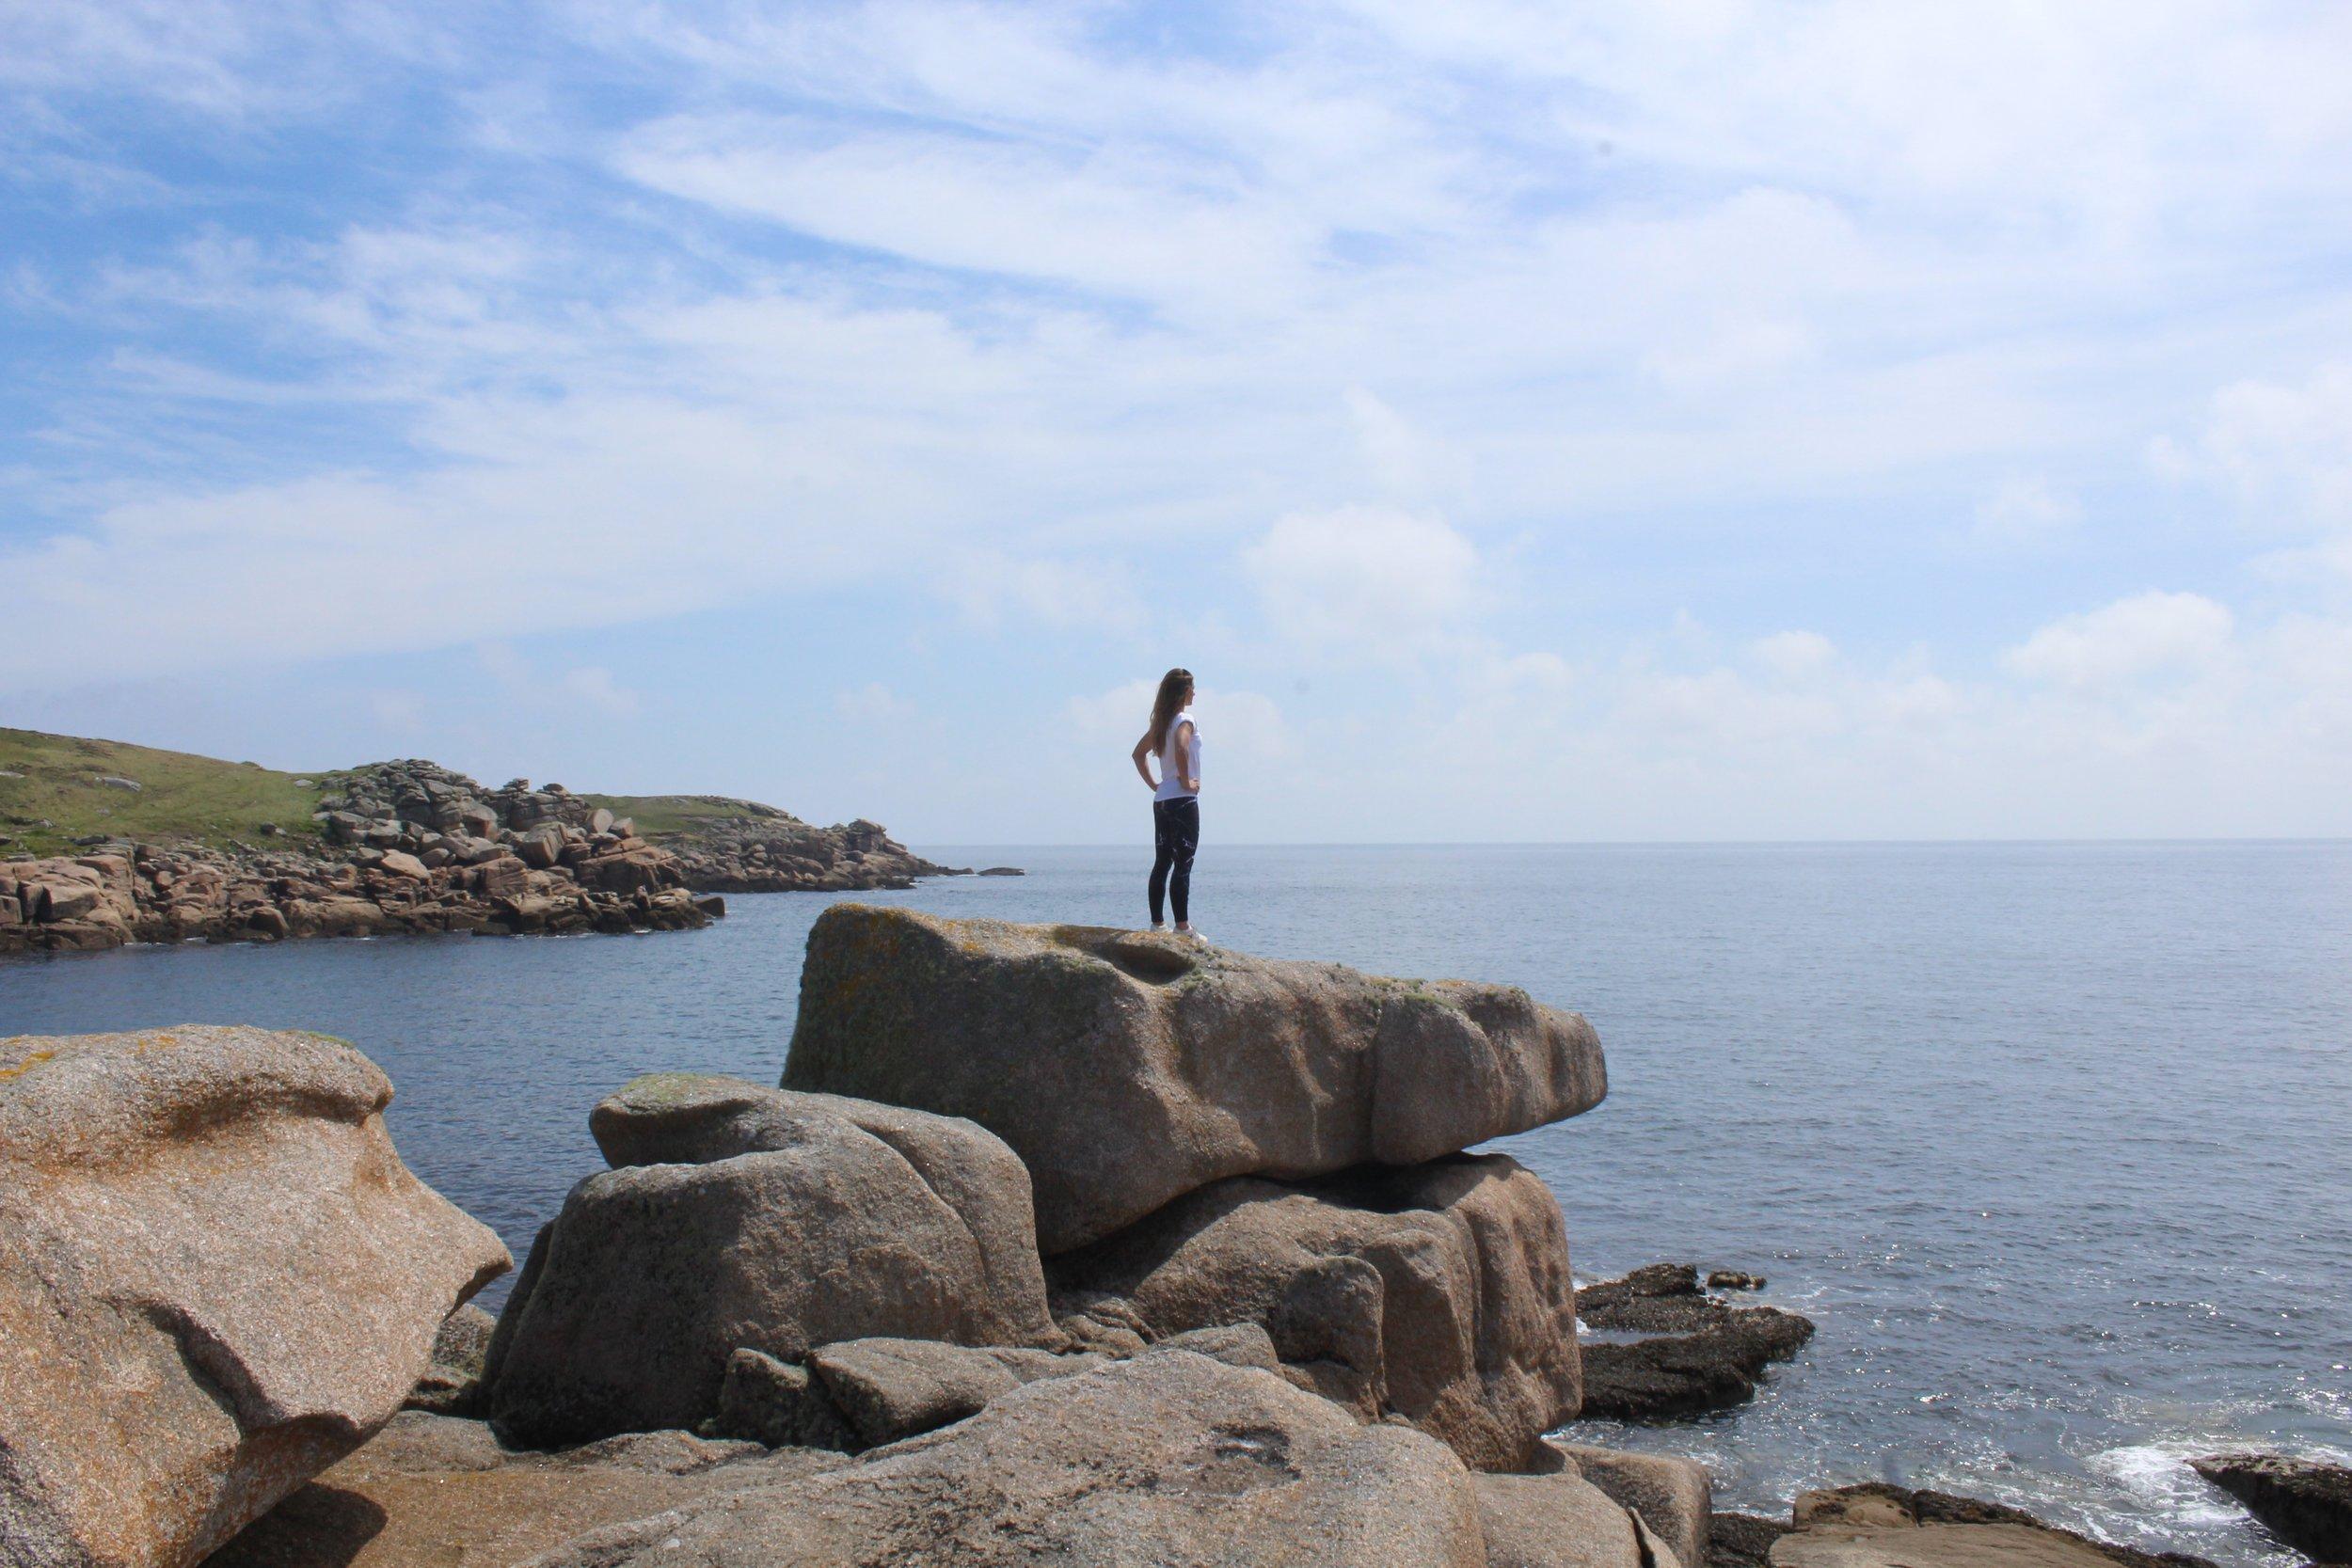 Views across the Atlantic Ocean